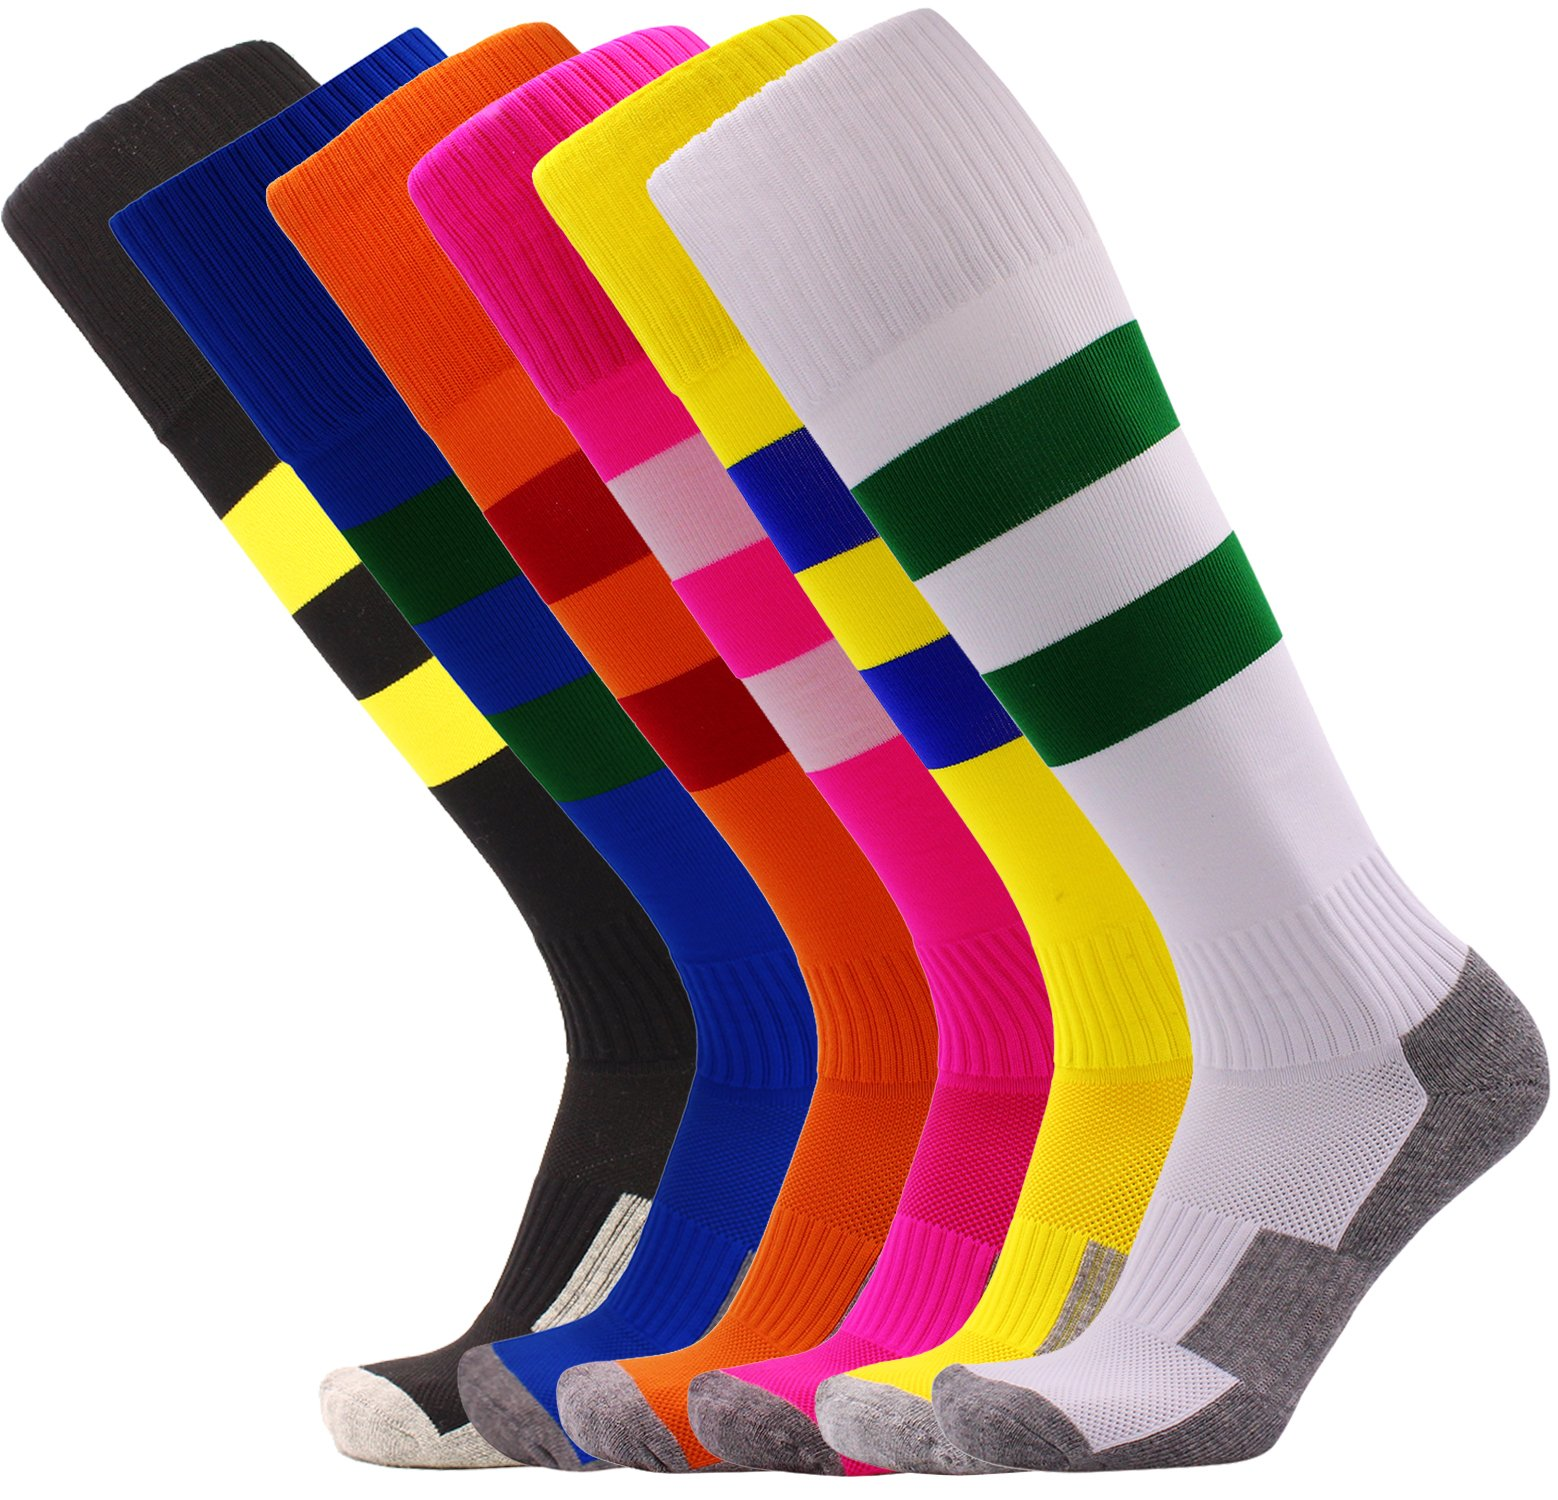 Kids Soccer Socks Bulk 6 Pack Young Boys/Girs Knee High Striped Sport Socks (Hot Pink + Orange + Yellow + Black + White + Royal Blue) by KALAKIDS